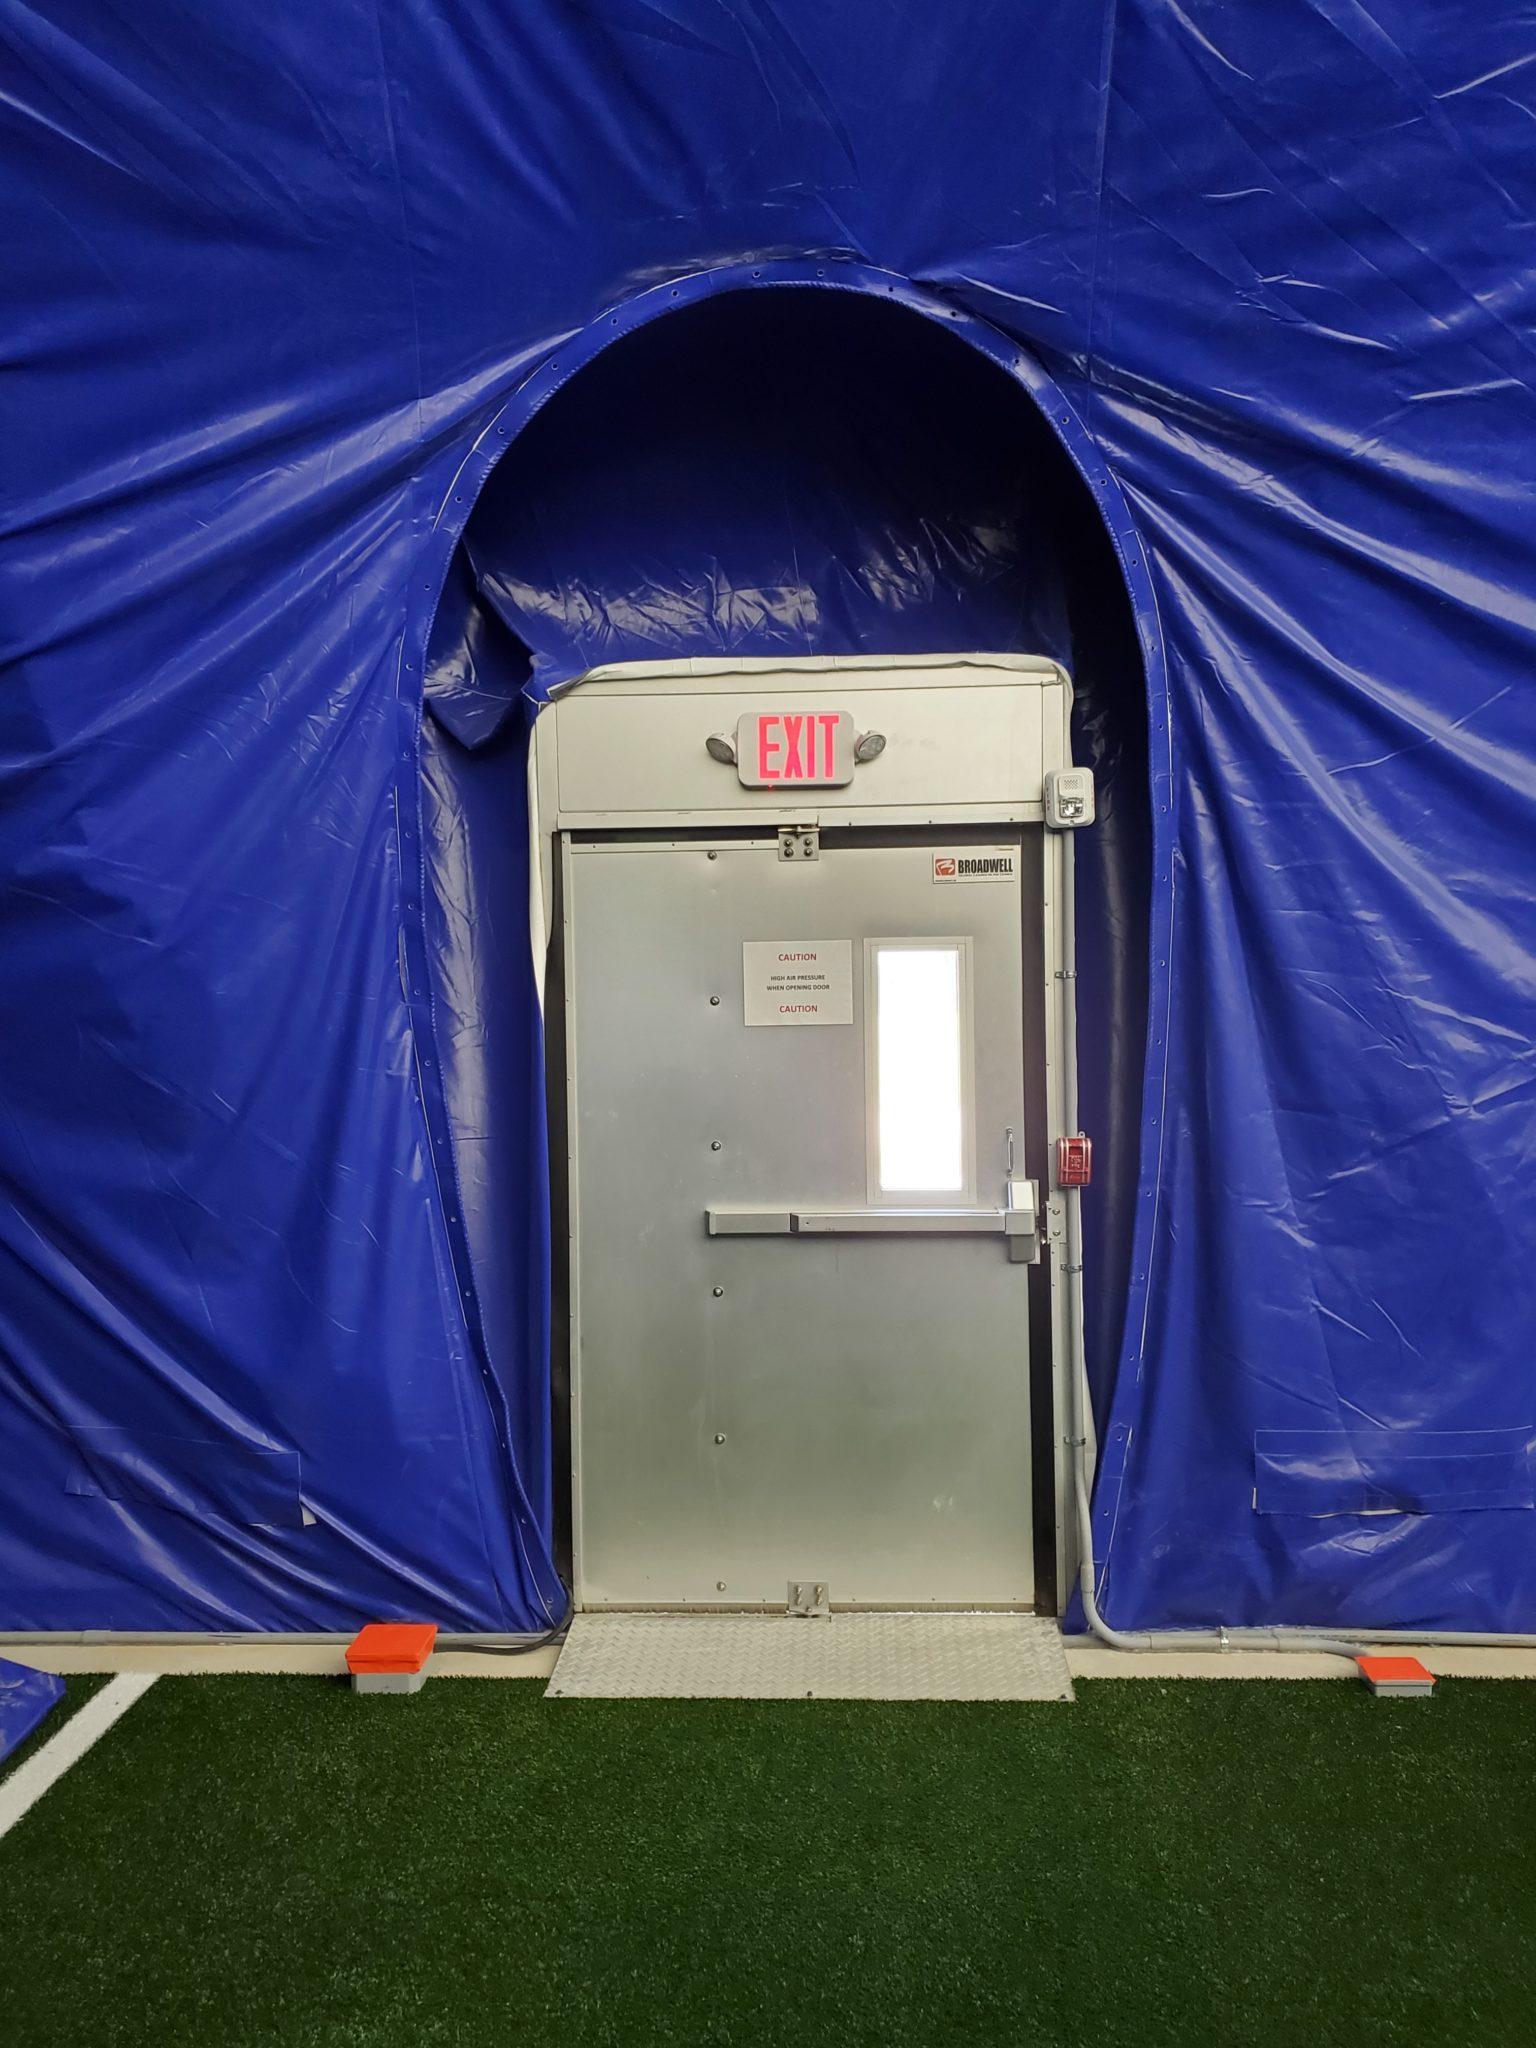 air dome emergency exit door